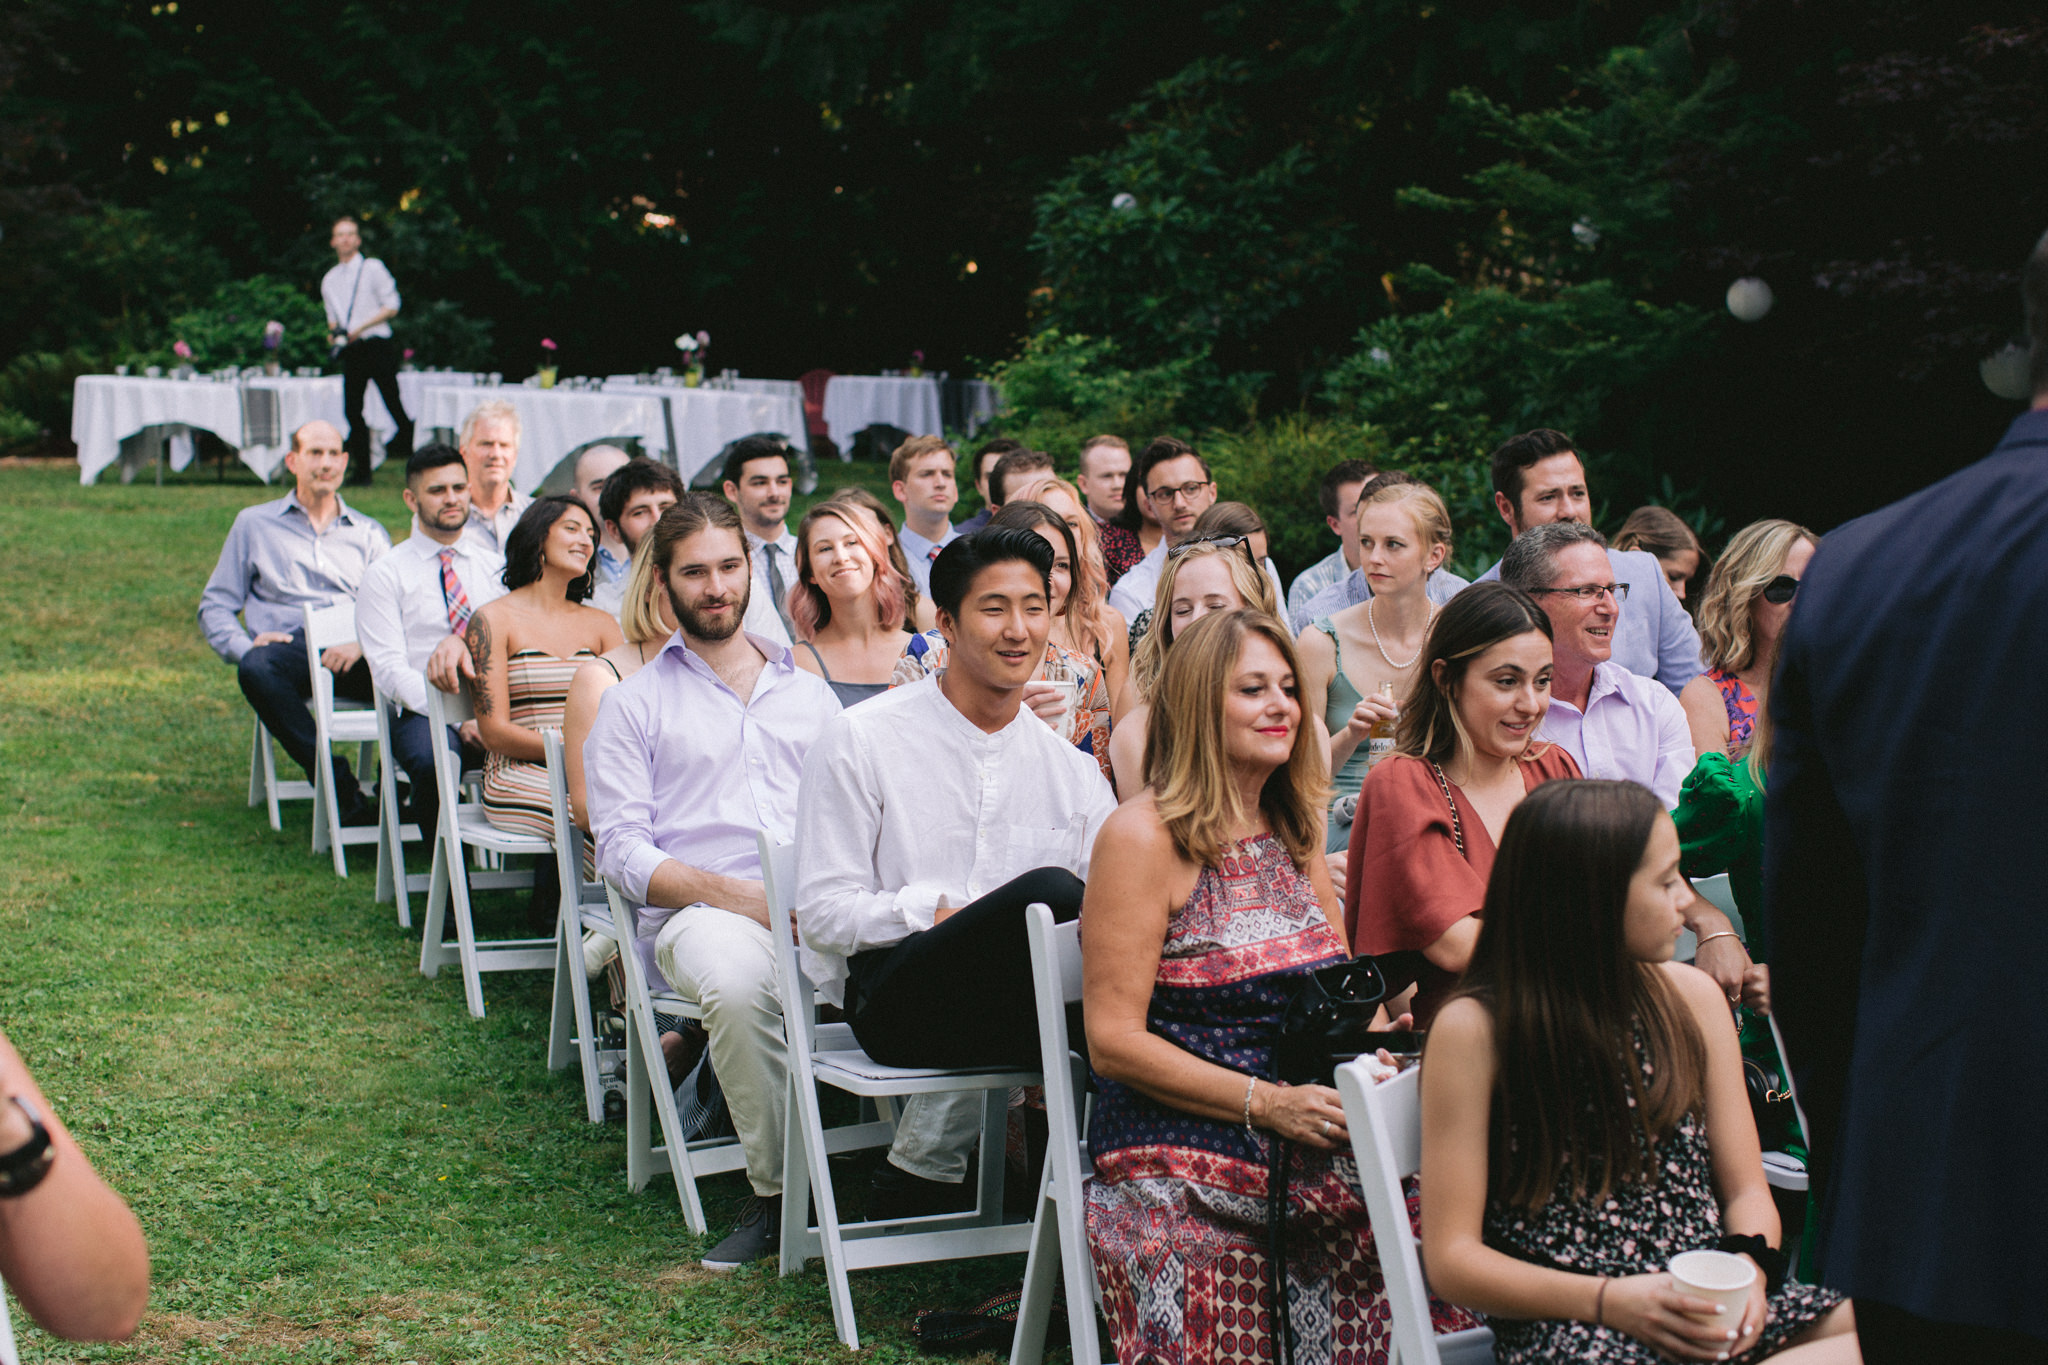 Backyard-Bainbridge-Island-Wedding-Alycia-Lovell-Photography-81.JPG